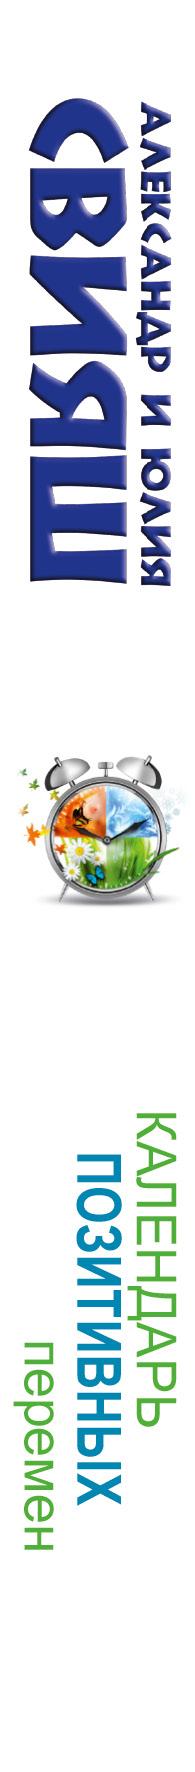 Календарь позитивных перемен